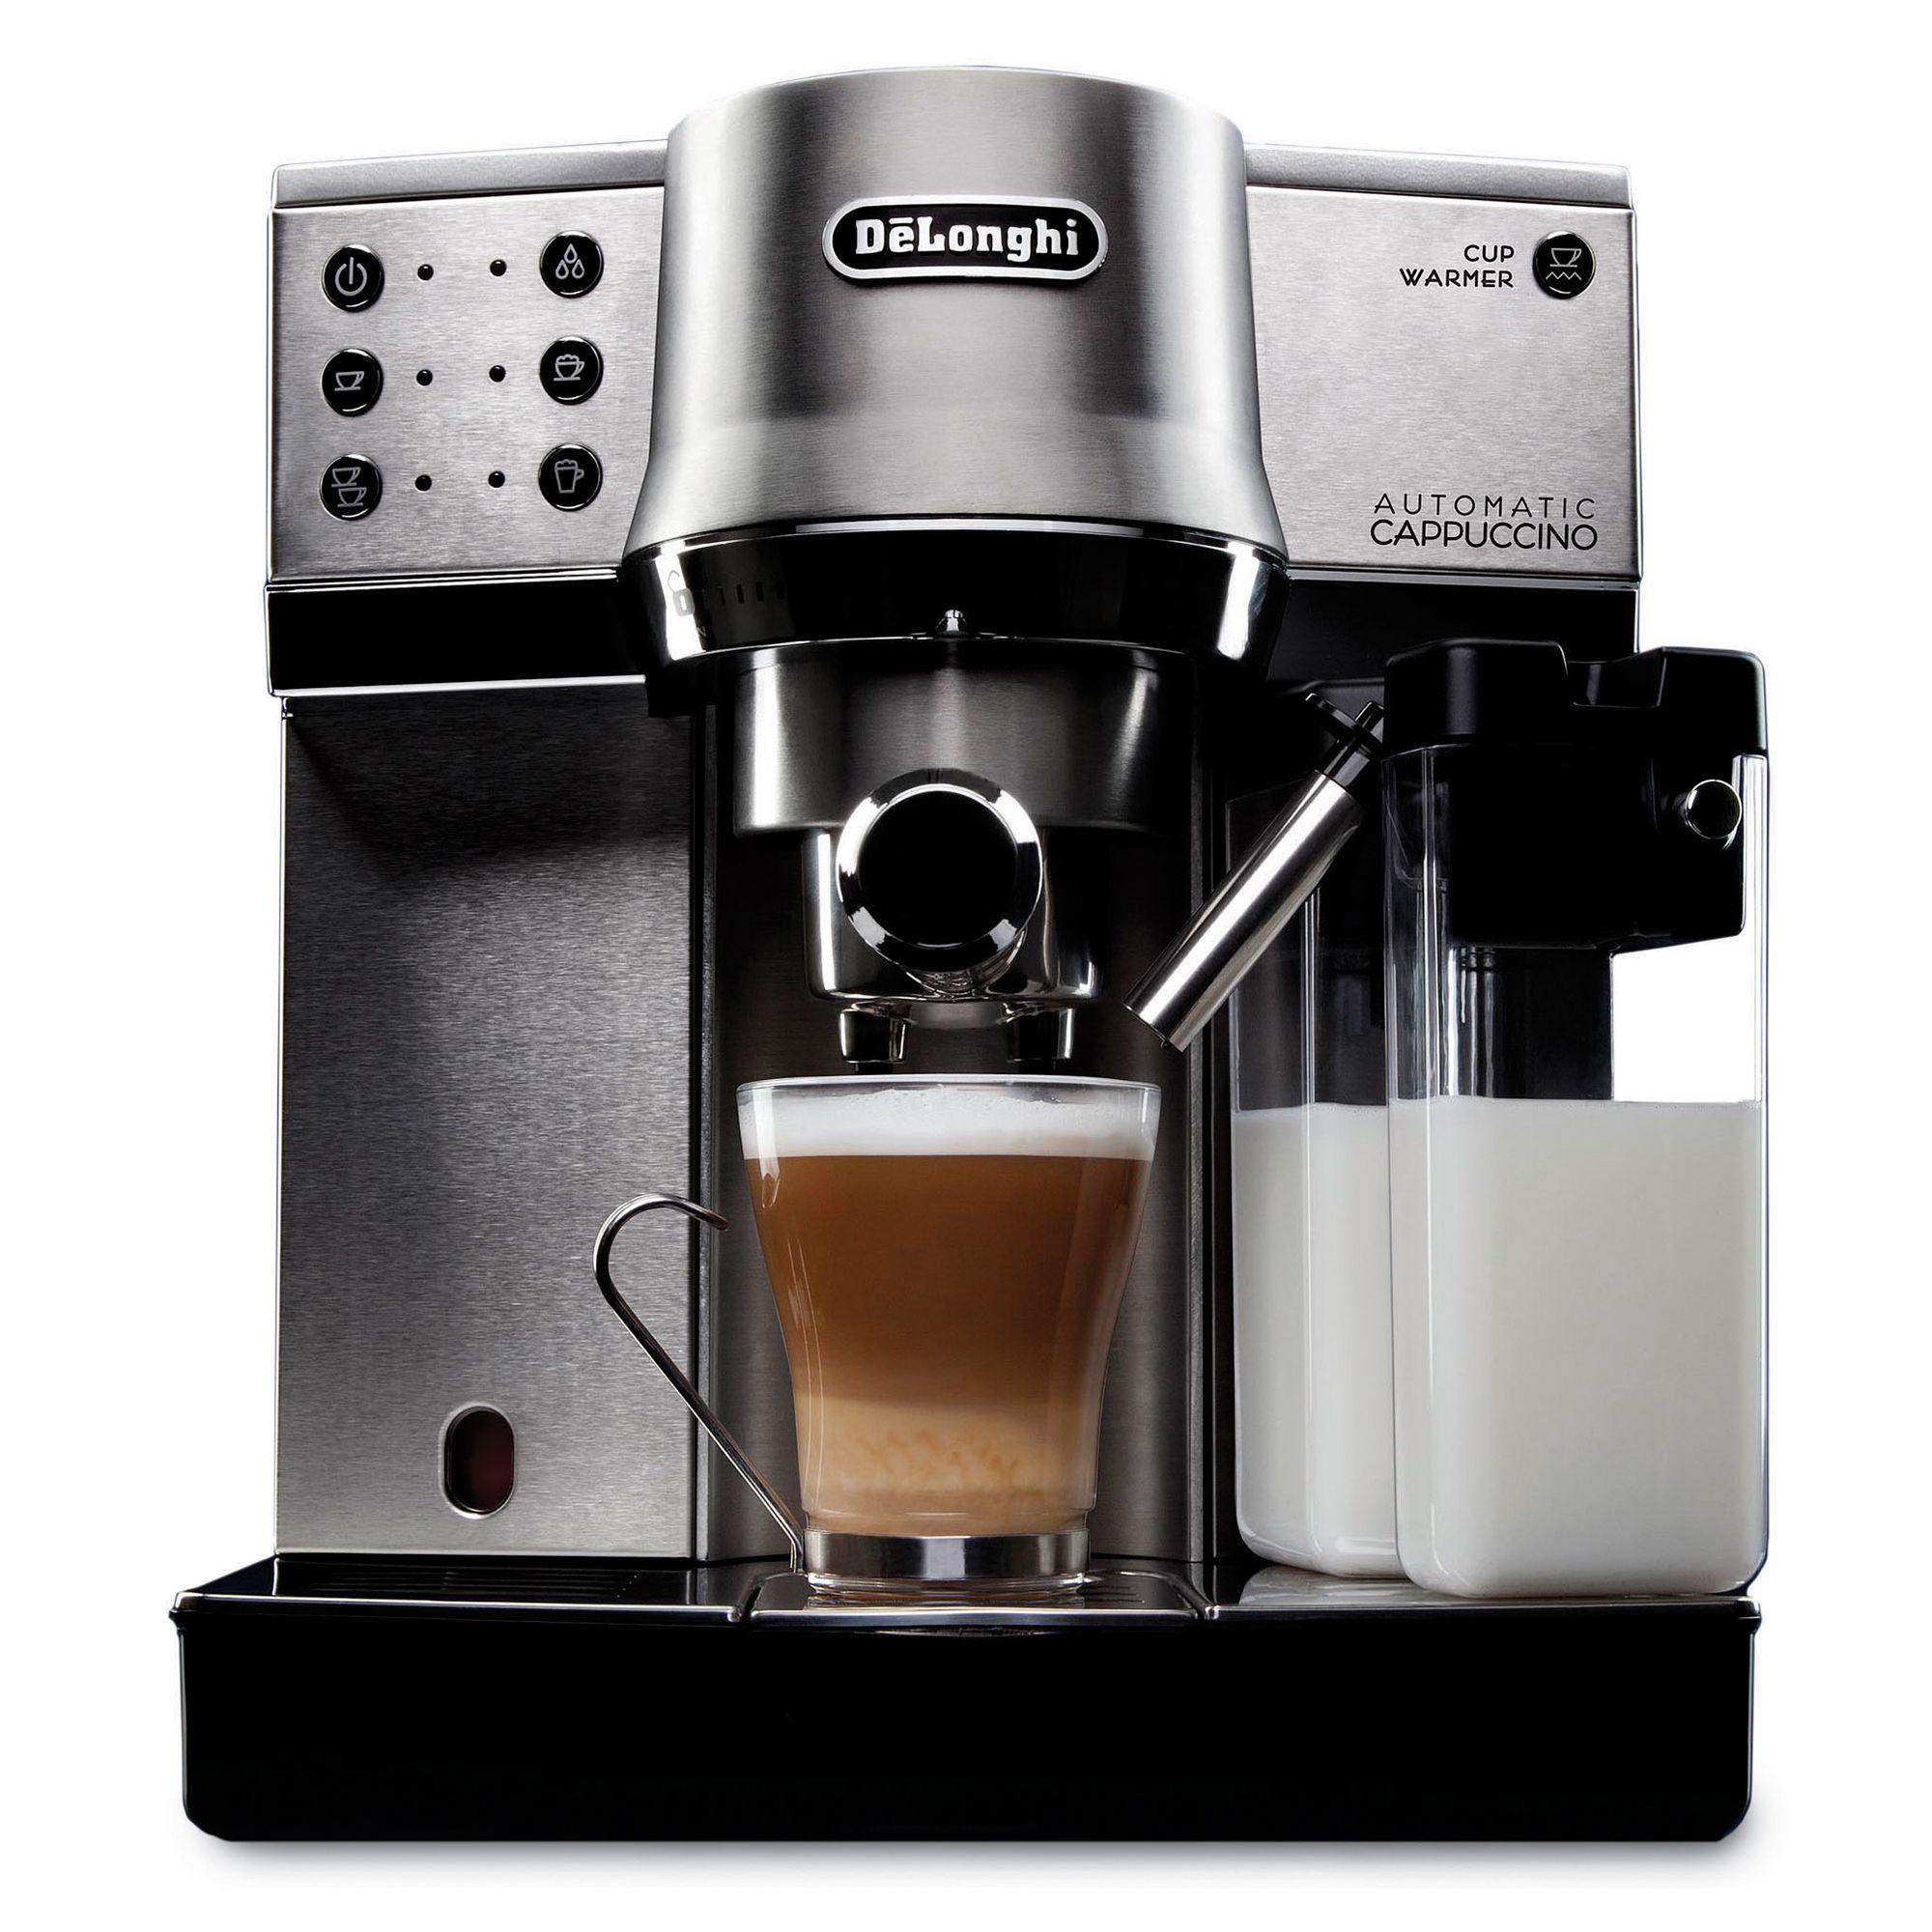 De'Longhi 20% Off Select Espresso Machines Event